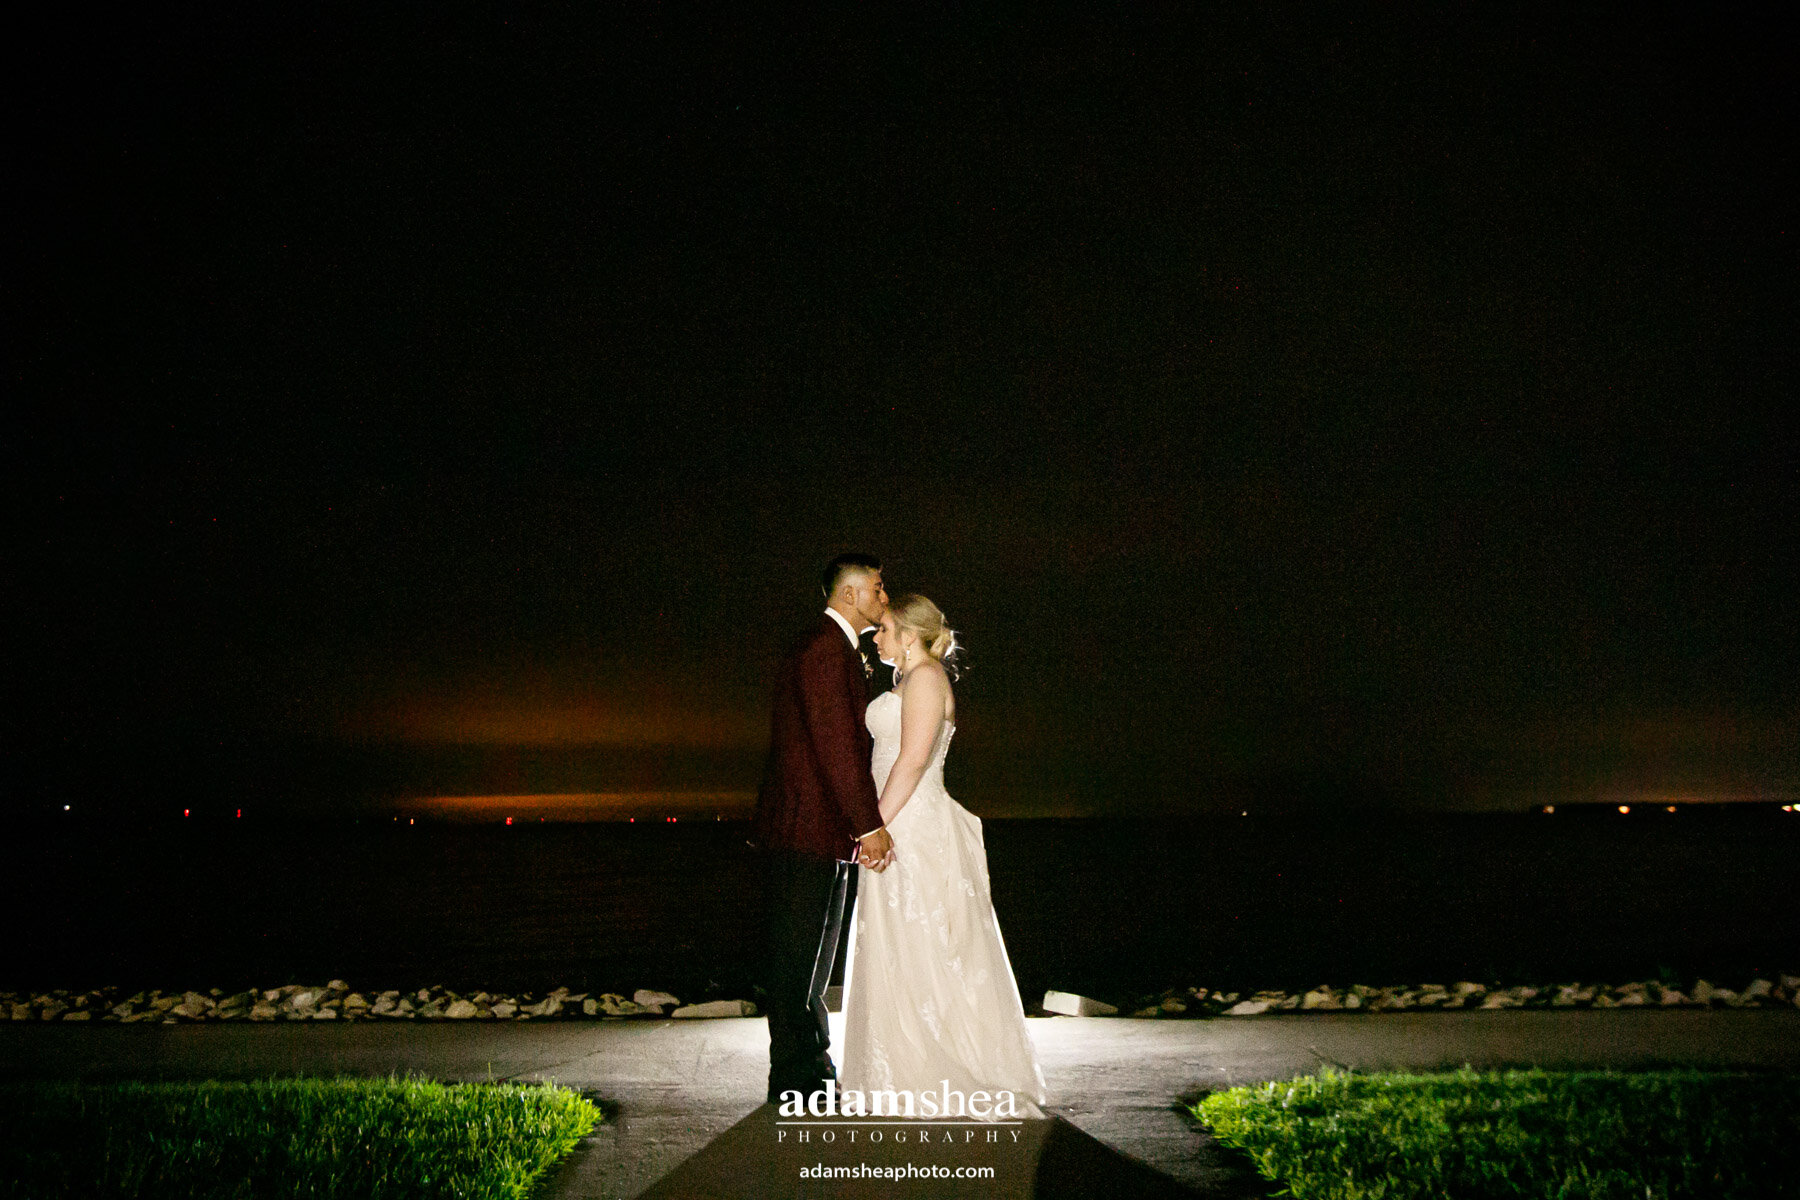 Taylor-Favian-Wedding-Menasha-WI-Waverly-Beach-Adam-Shea-Photography00005.jpg